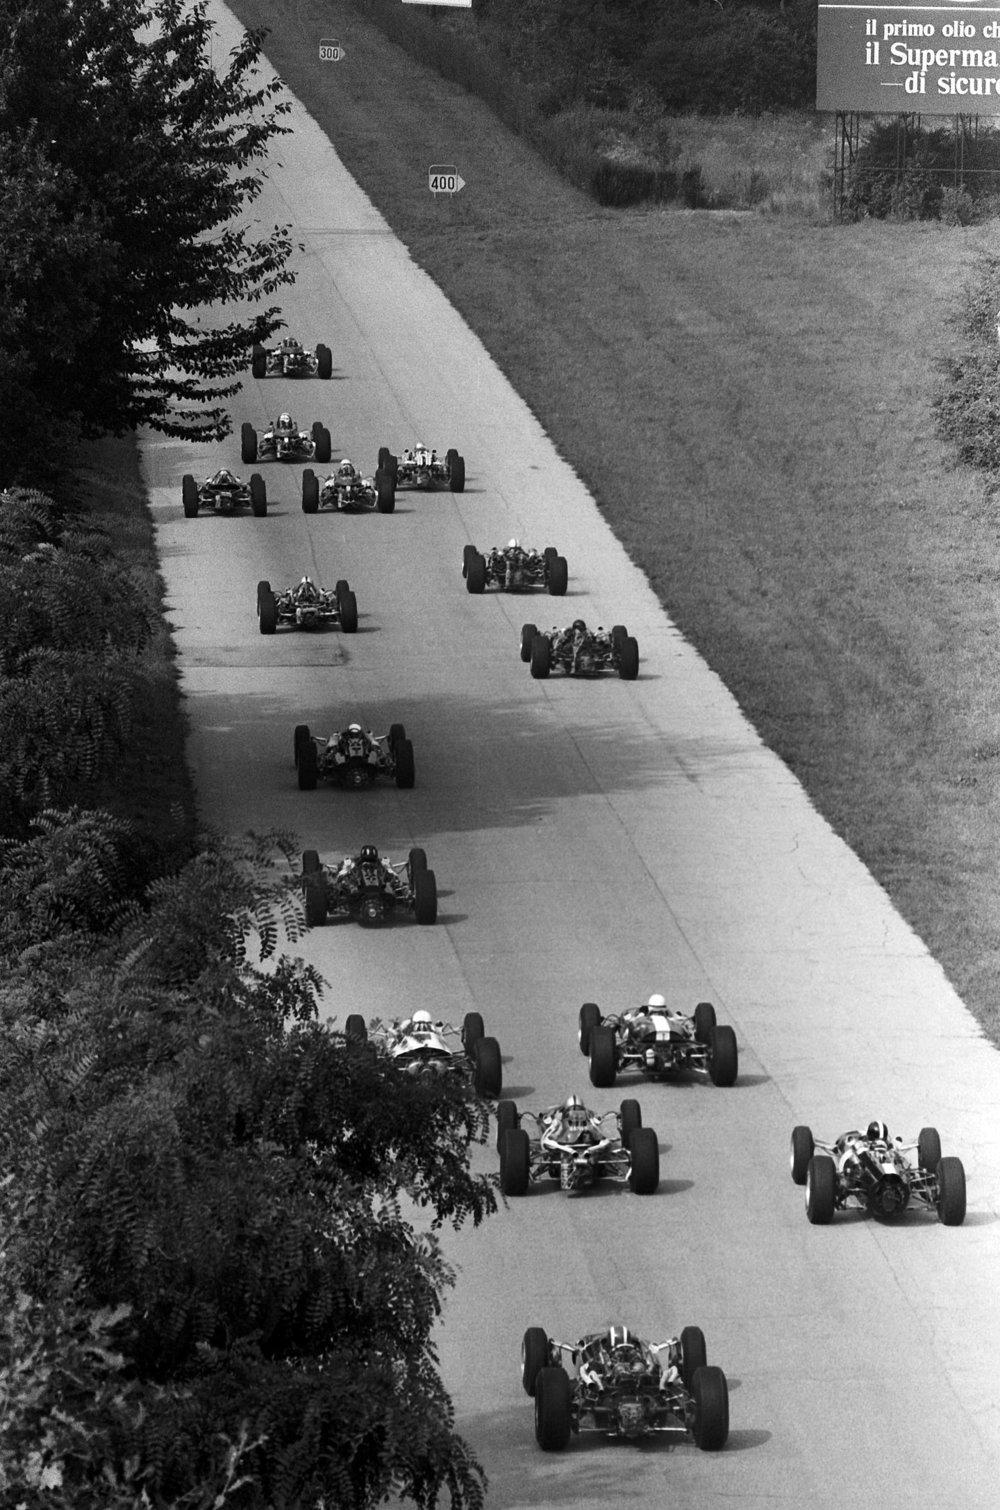 1967 Italian Grand Prix race start